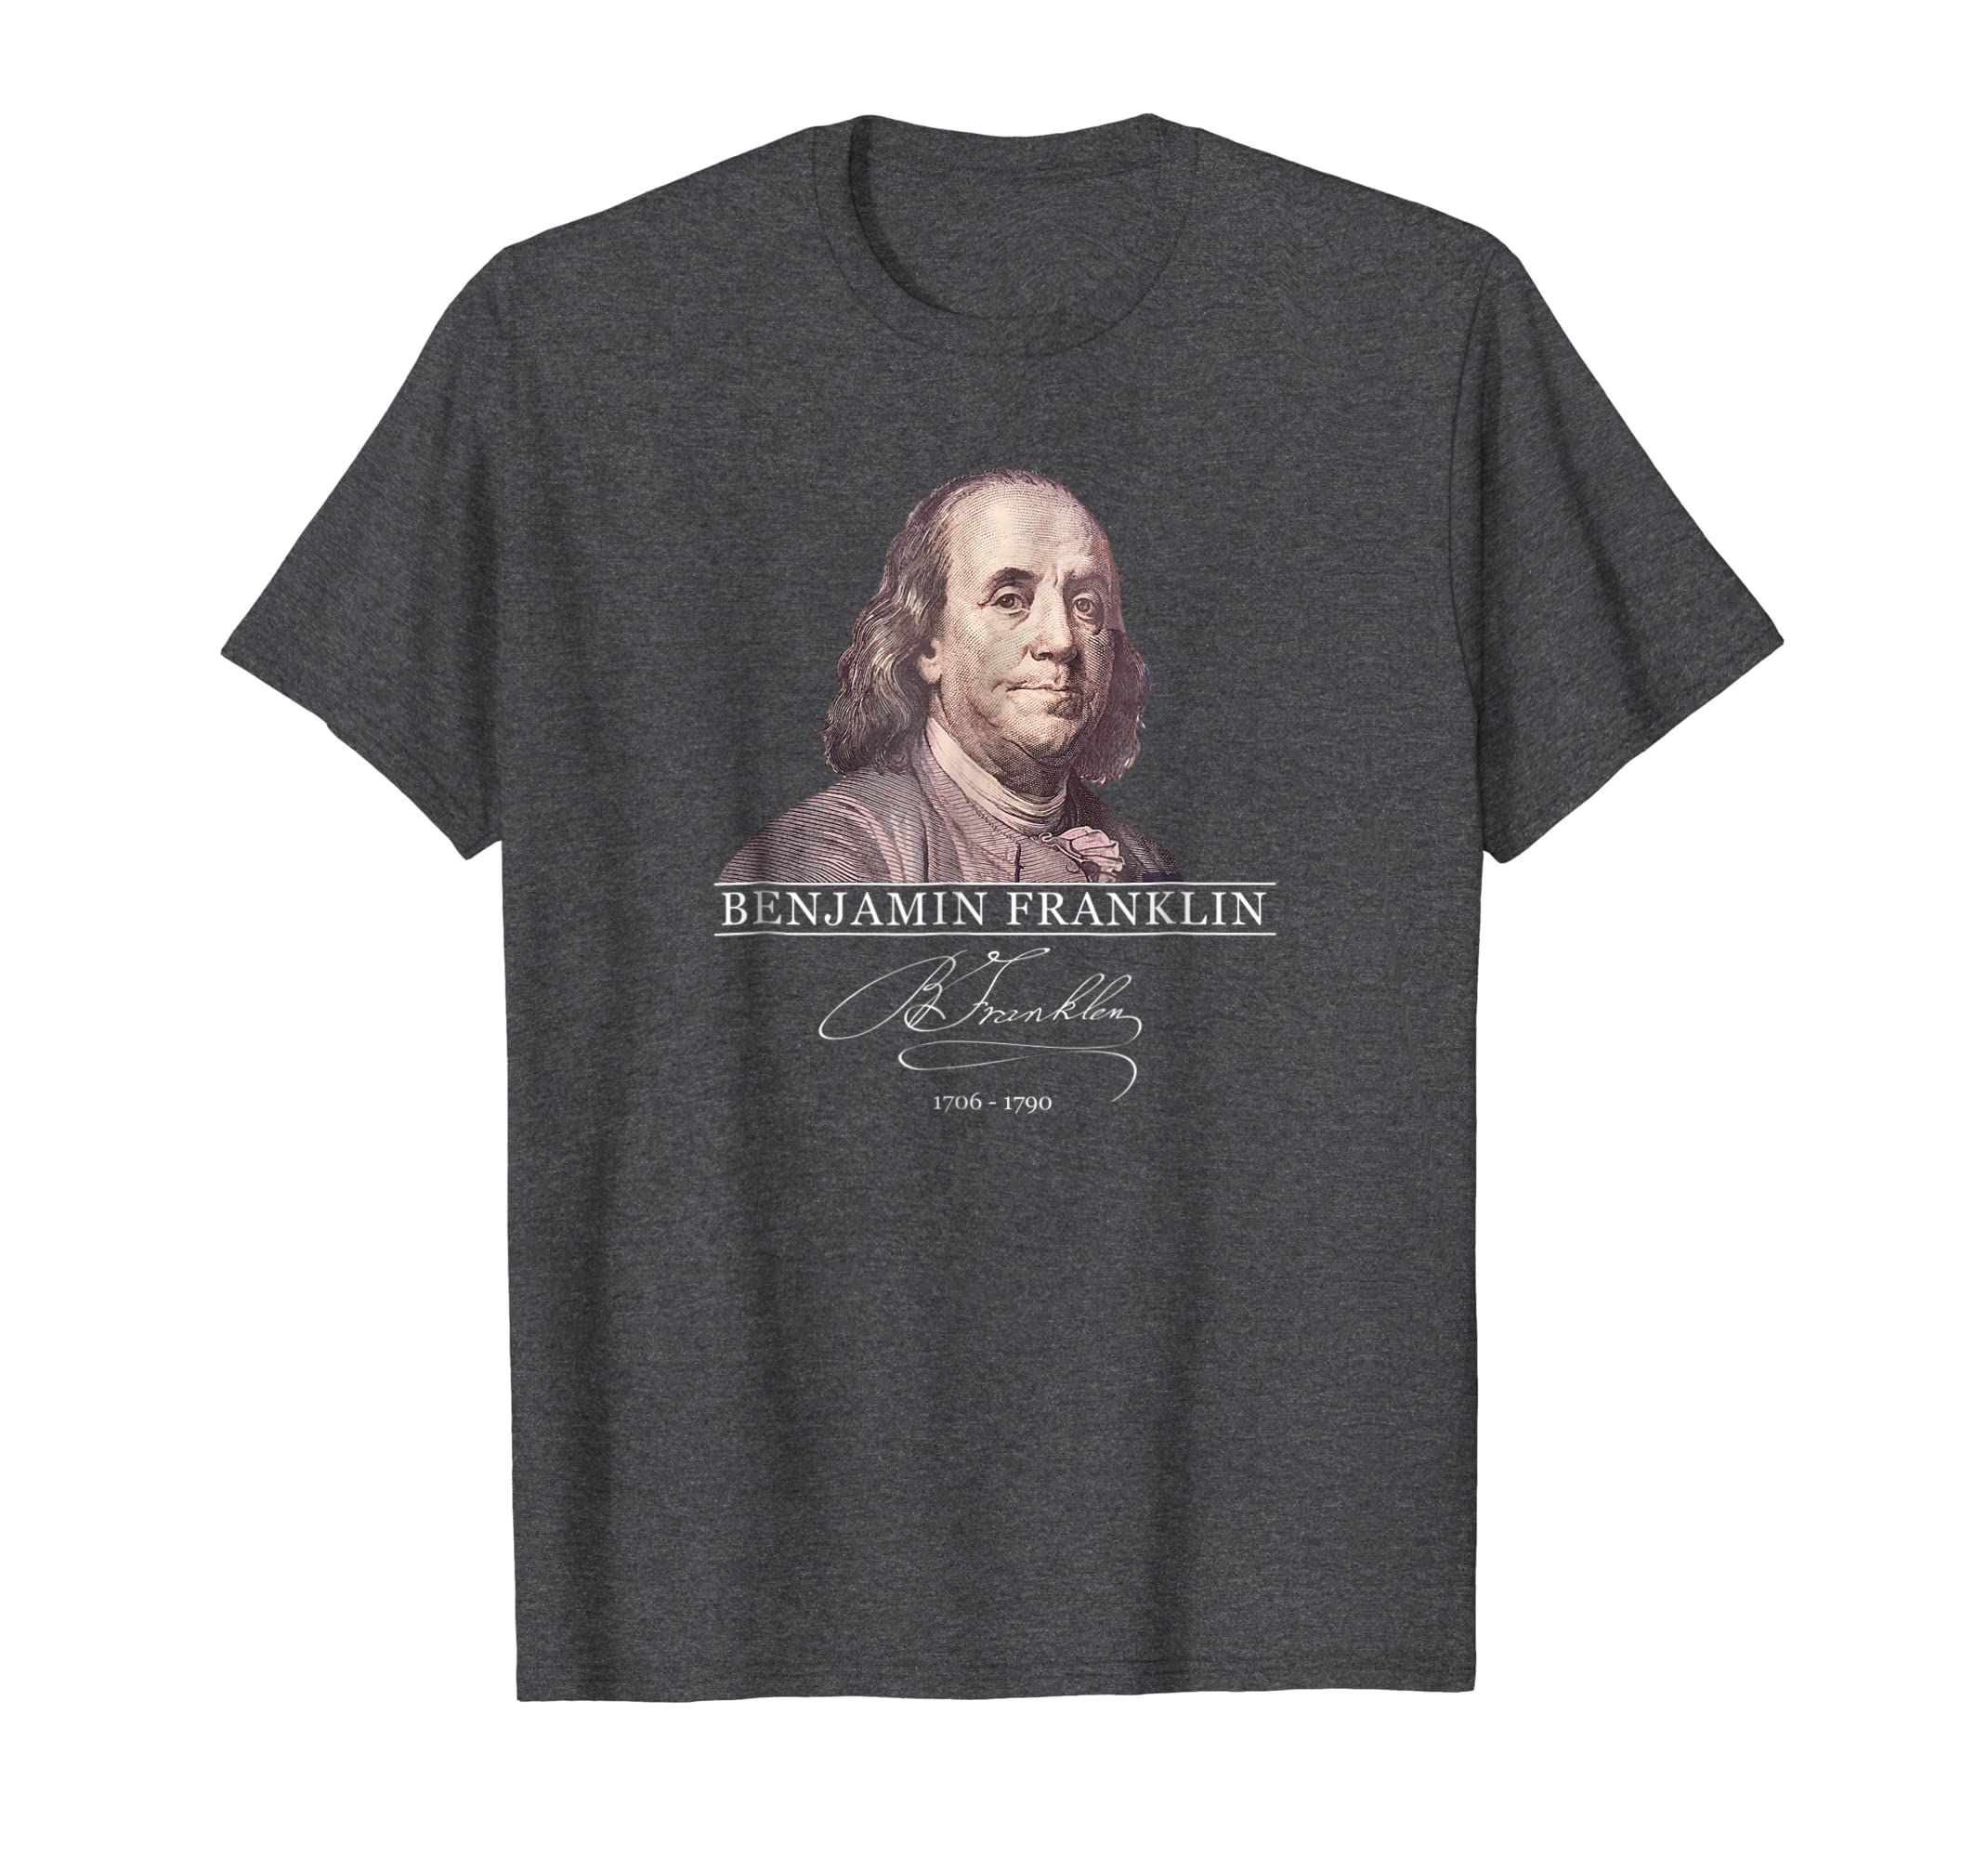 Benjamin Franklin portrait on Shirt from U.S. money currency-ln